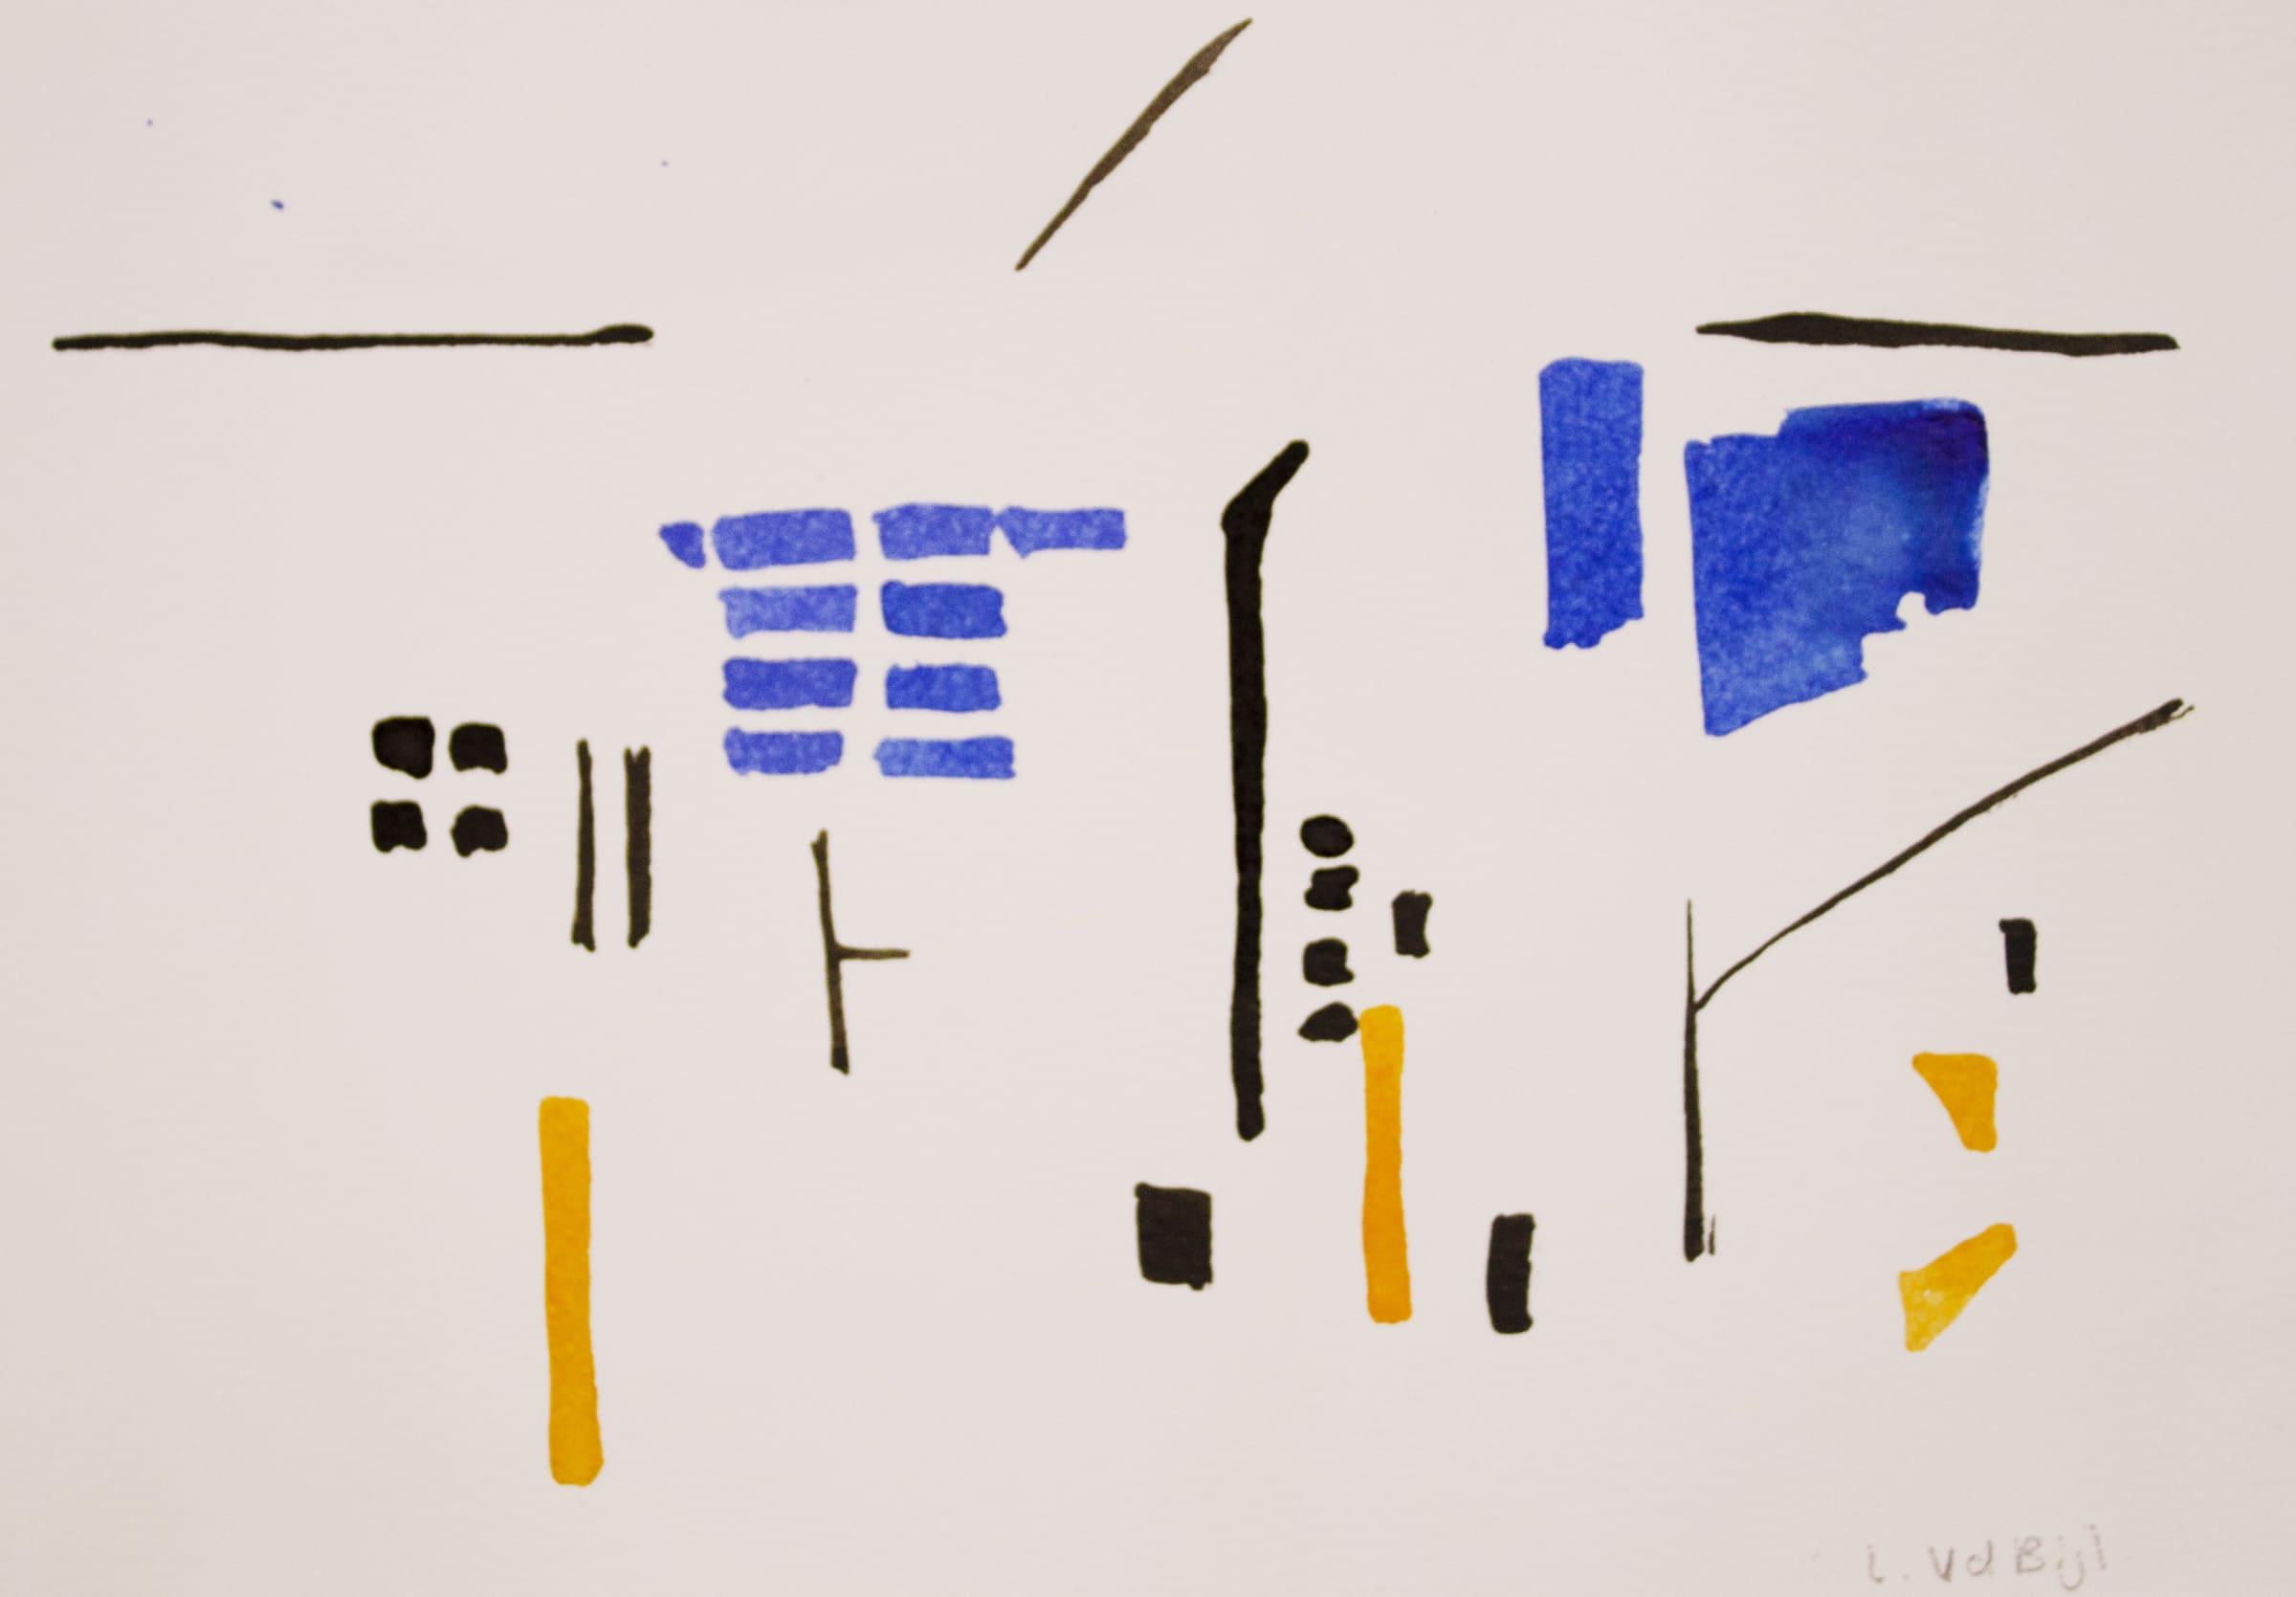 <span class=&#34;link fancybox-details-link&#34;><a href=&#34;/artists/88-louise-van-der-bijl/works/2286-louise-van-der-bijl-inktober-day-23-2018/&#34;>View Detail Page</a></span><div class=&#34;artist&#34;><strong>Louise Van Der Bijl</strong></div> <div class=&#34;title&#34;><em>Inktober Day 23</em>, 2018</div> <div class=&#34;medium&#34;>Ink On Paper</div> <div class=&#34;dimensions&#34;>15.1cm x 21.3cm</div><div class=&#34;price&#34;>R400.00</div>